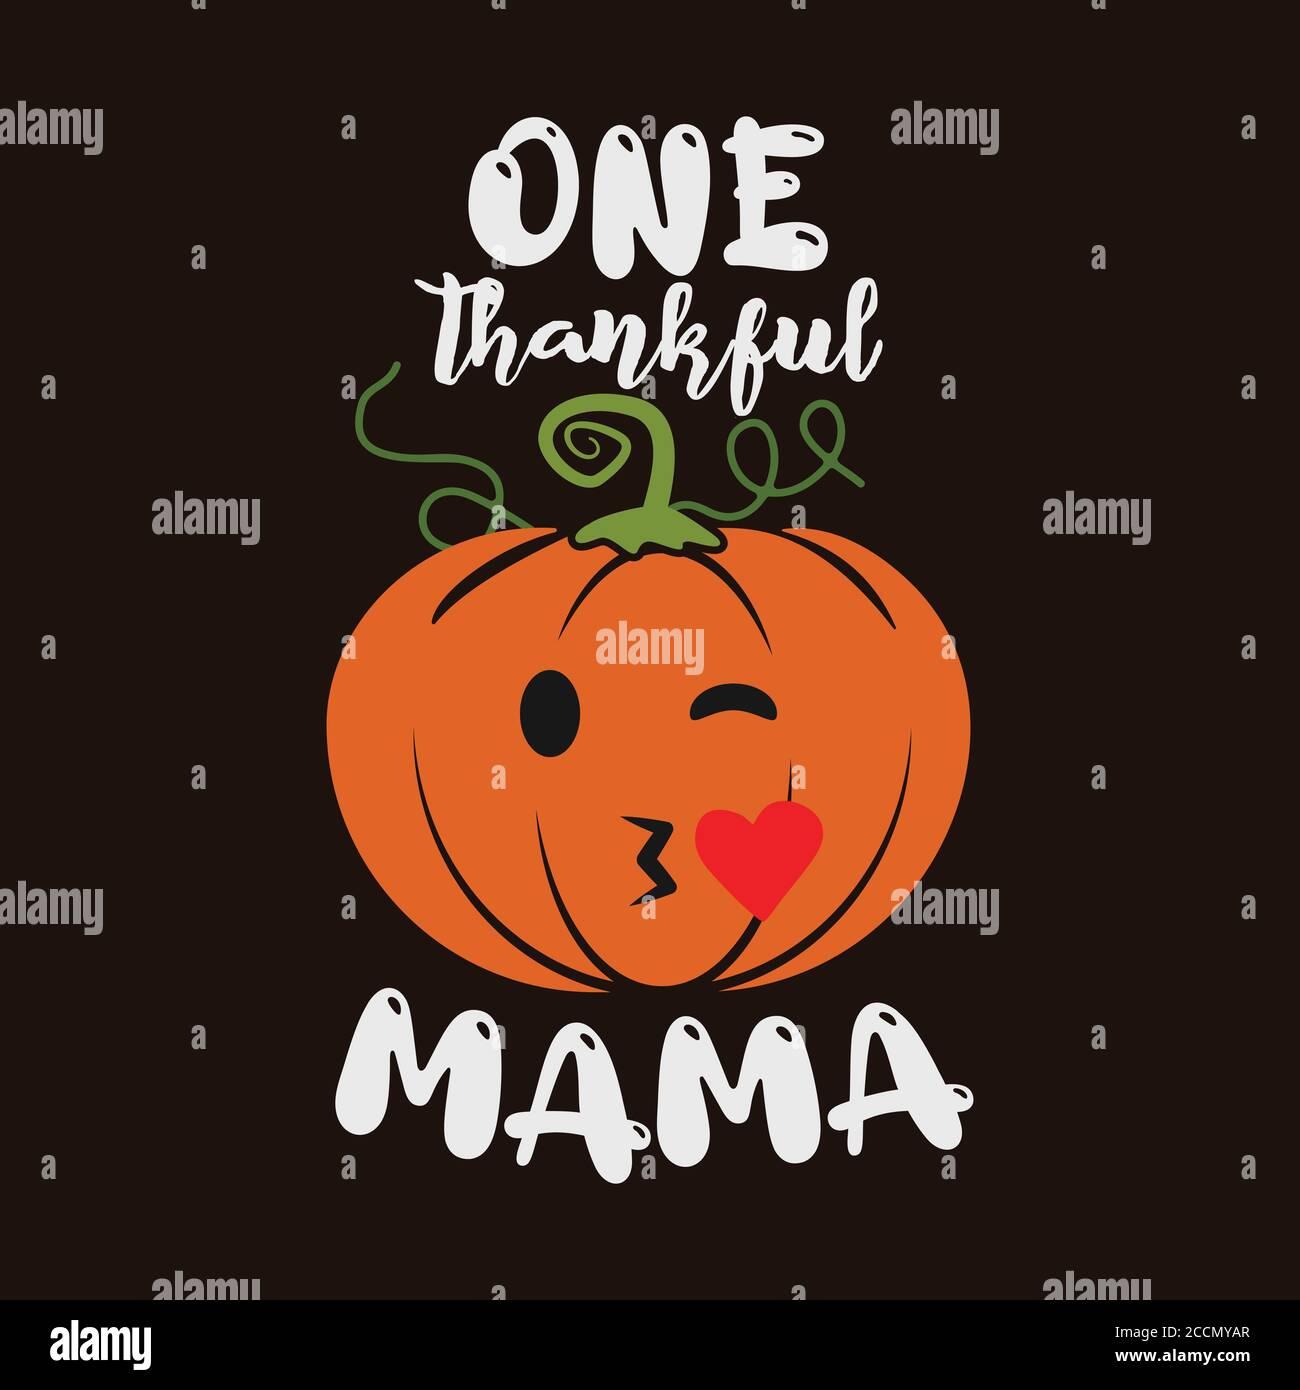 Thanksgiving emblem t shirt design. One Thankful mama logo template. Holiday poster with pumpkin. Vector halloween badge illustration. Stock Vector